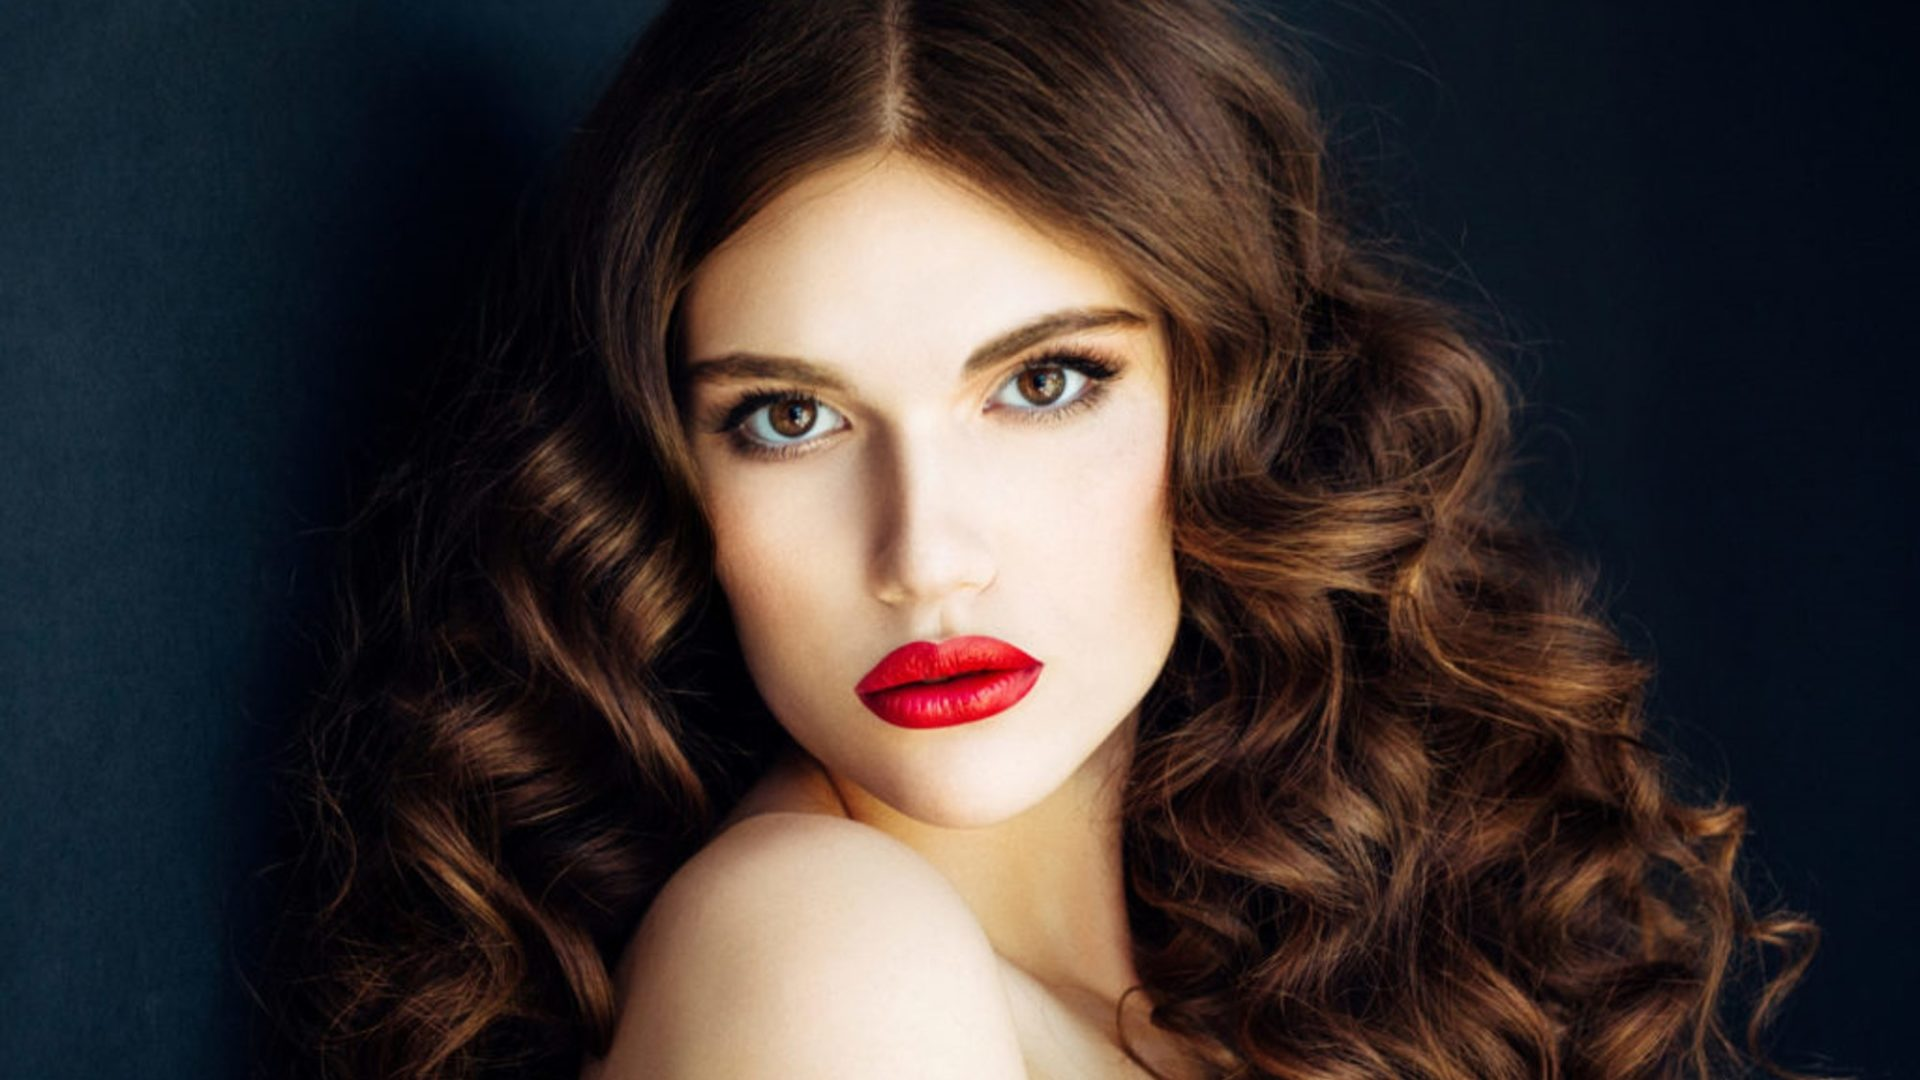 hair extensions correction Monaco Salon in Tampa